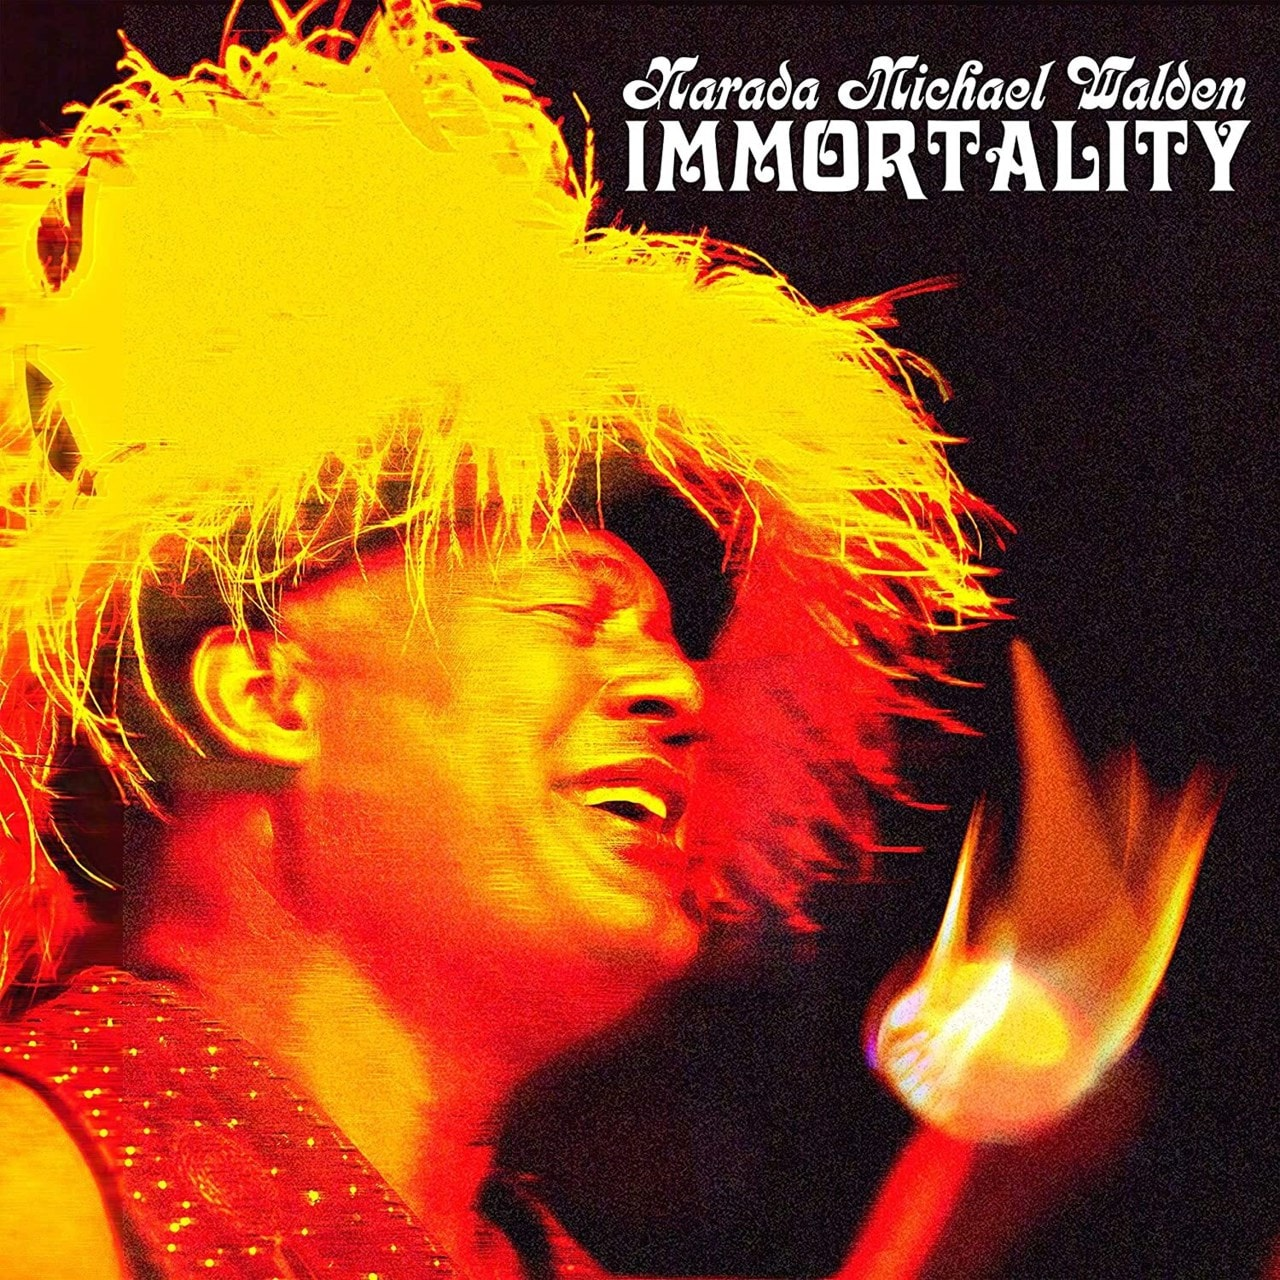 Immortality - 1